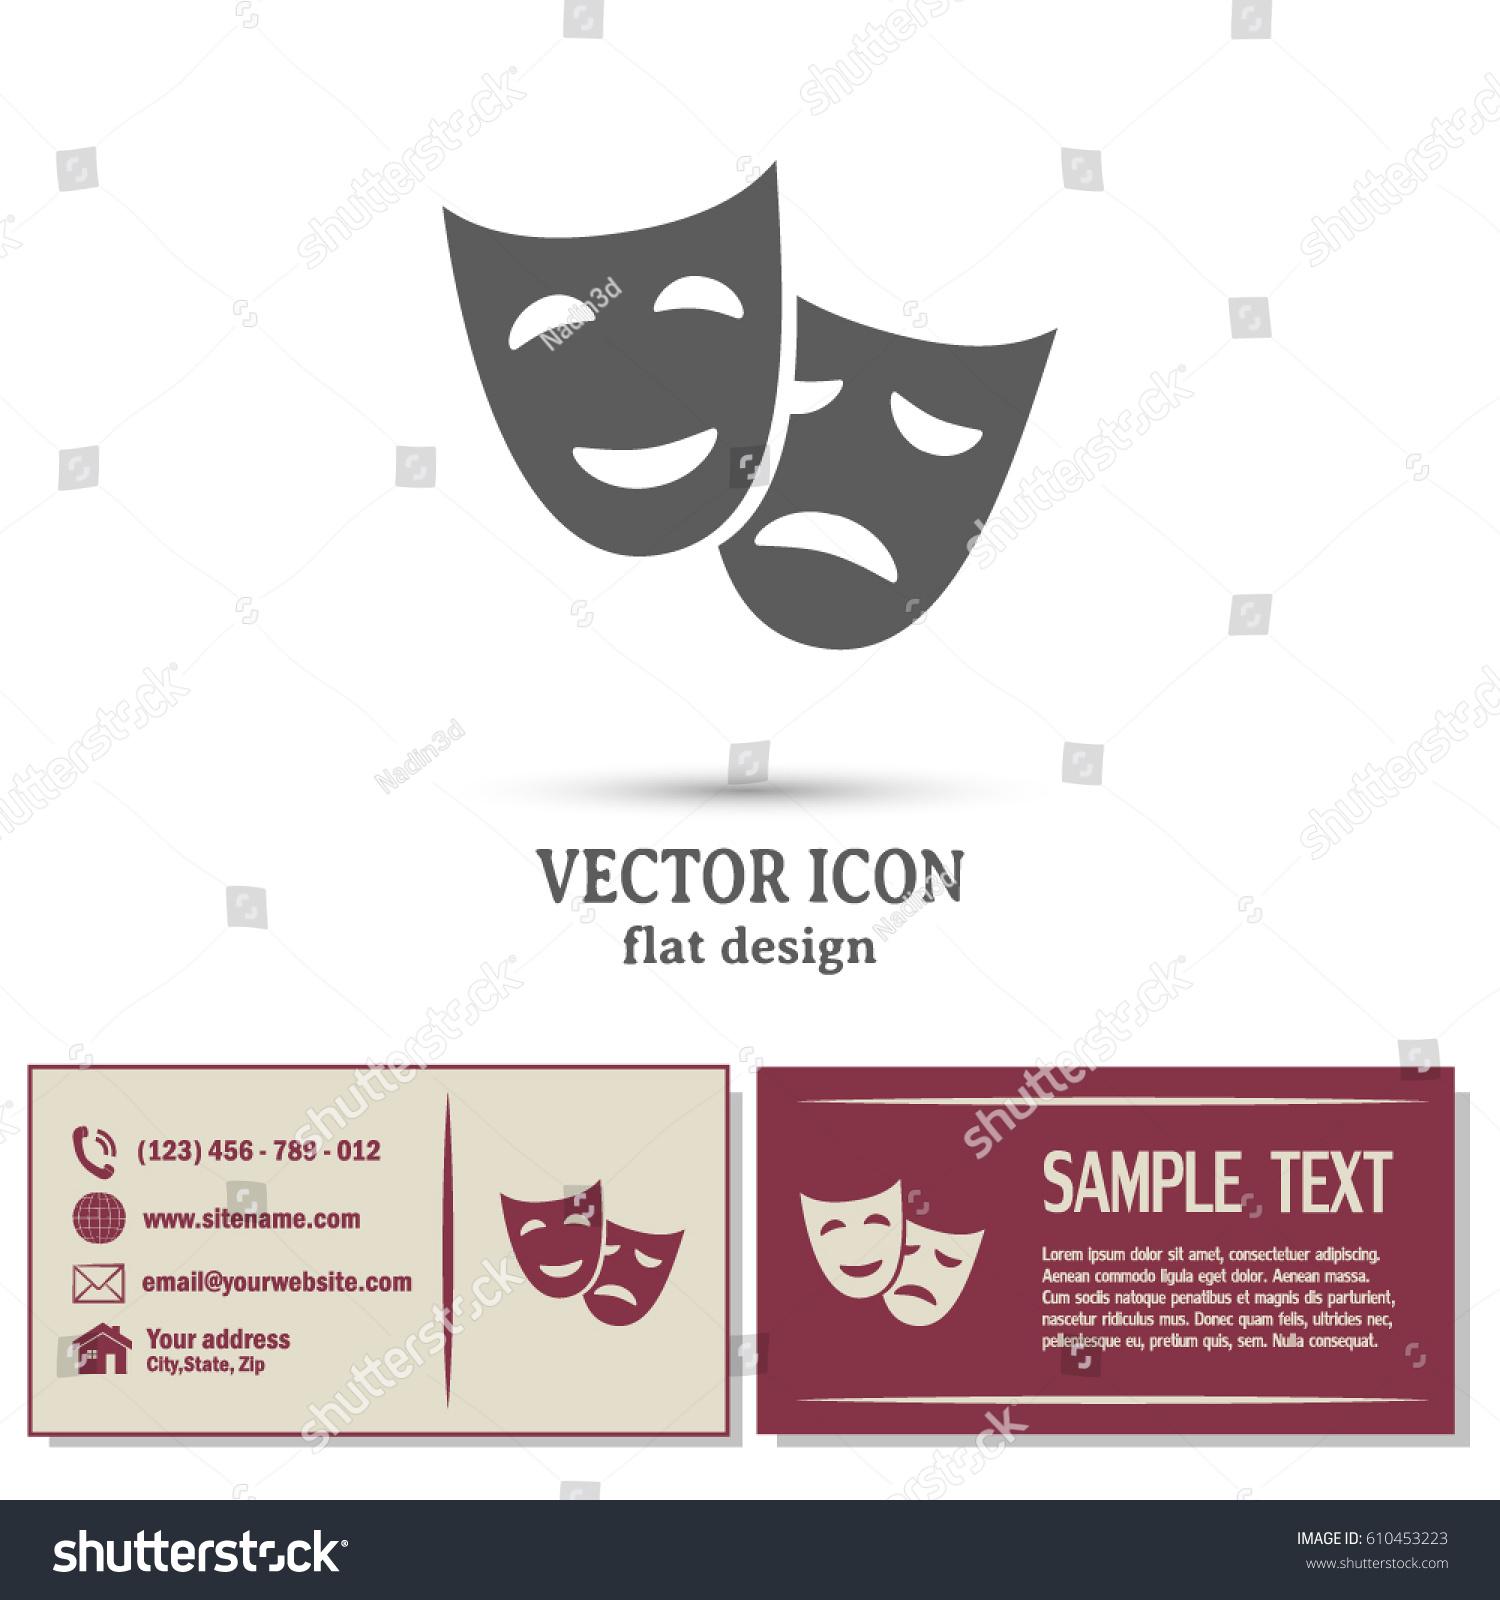 Business Cards Design Facial Mask Symbol Stock Vector 610453223 ...